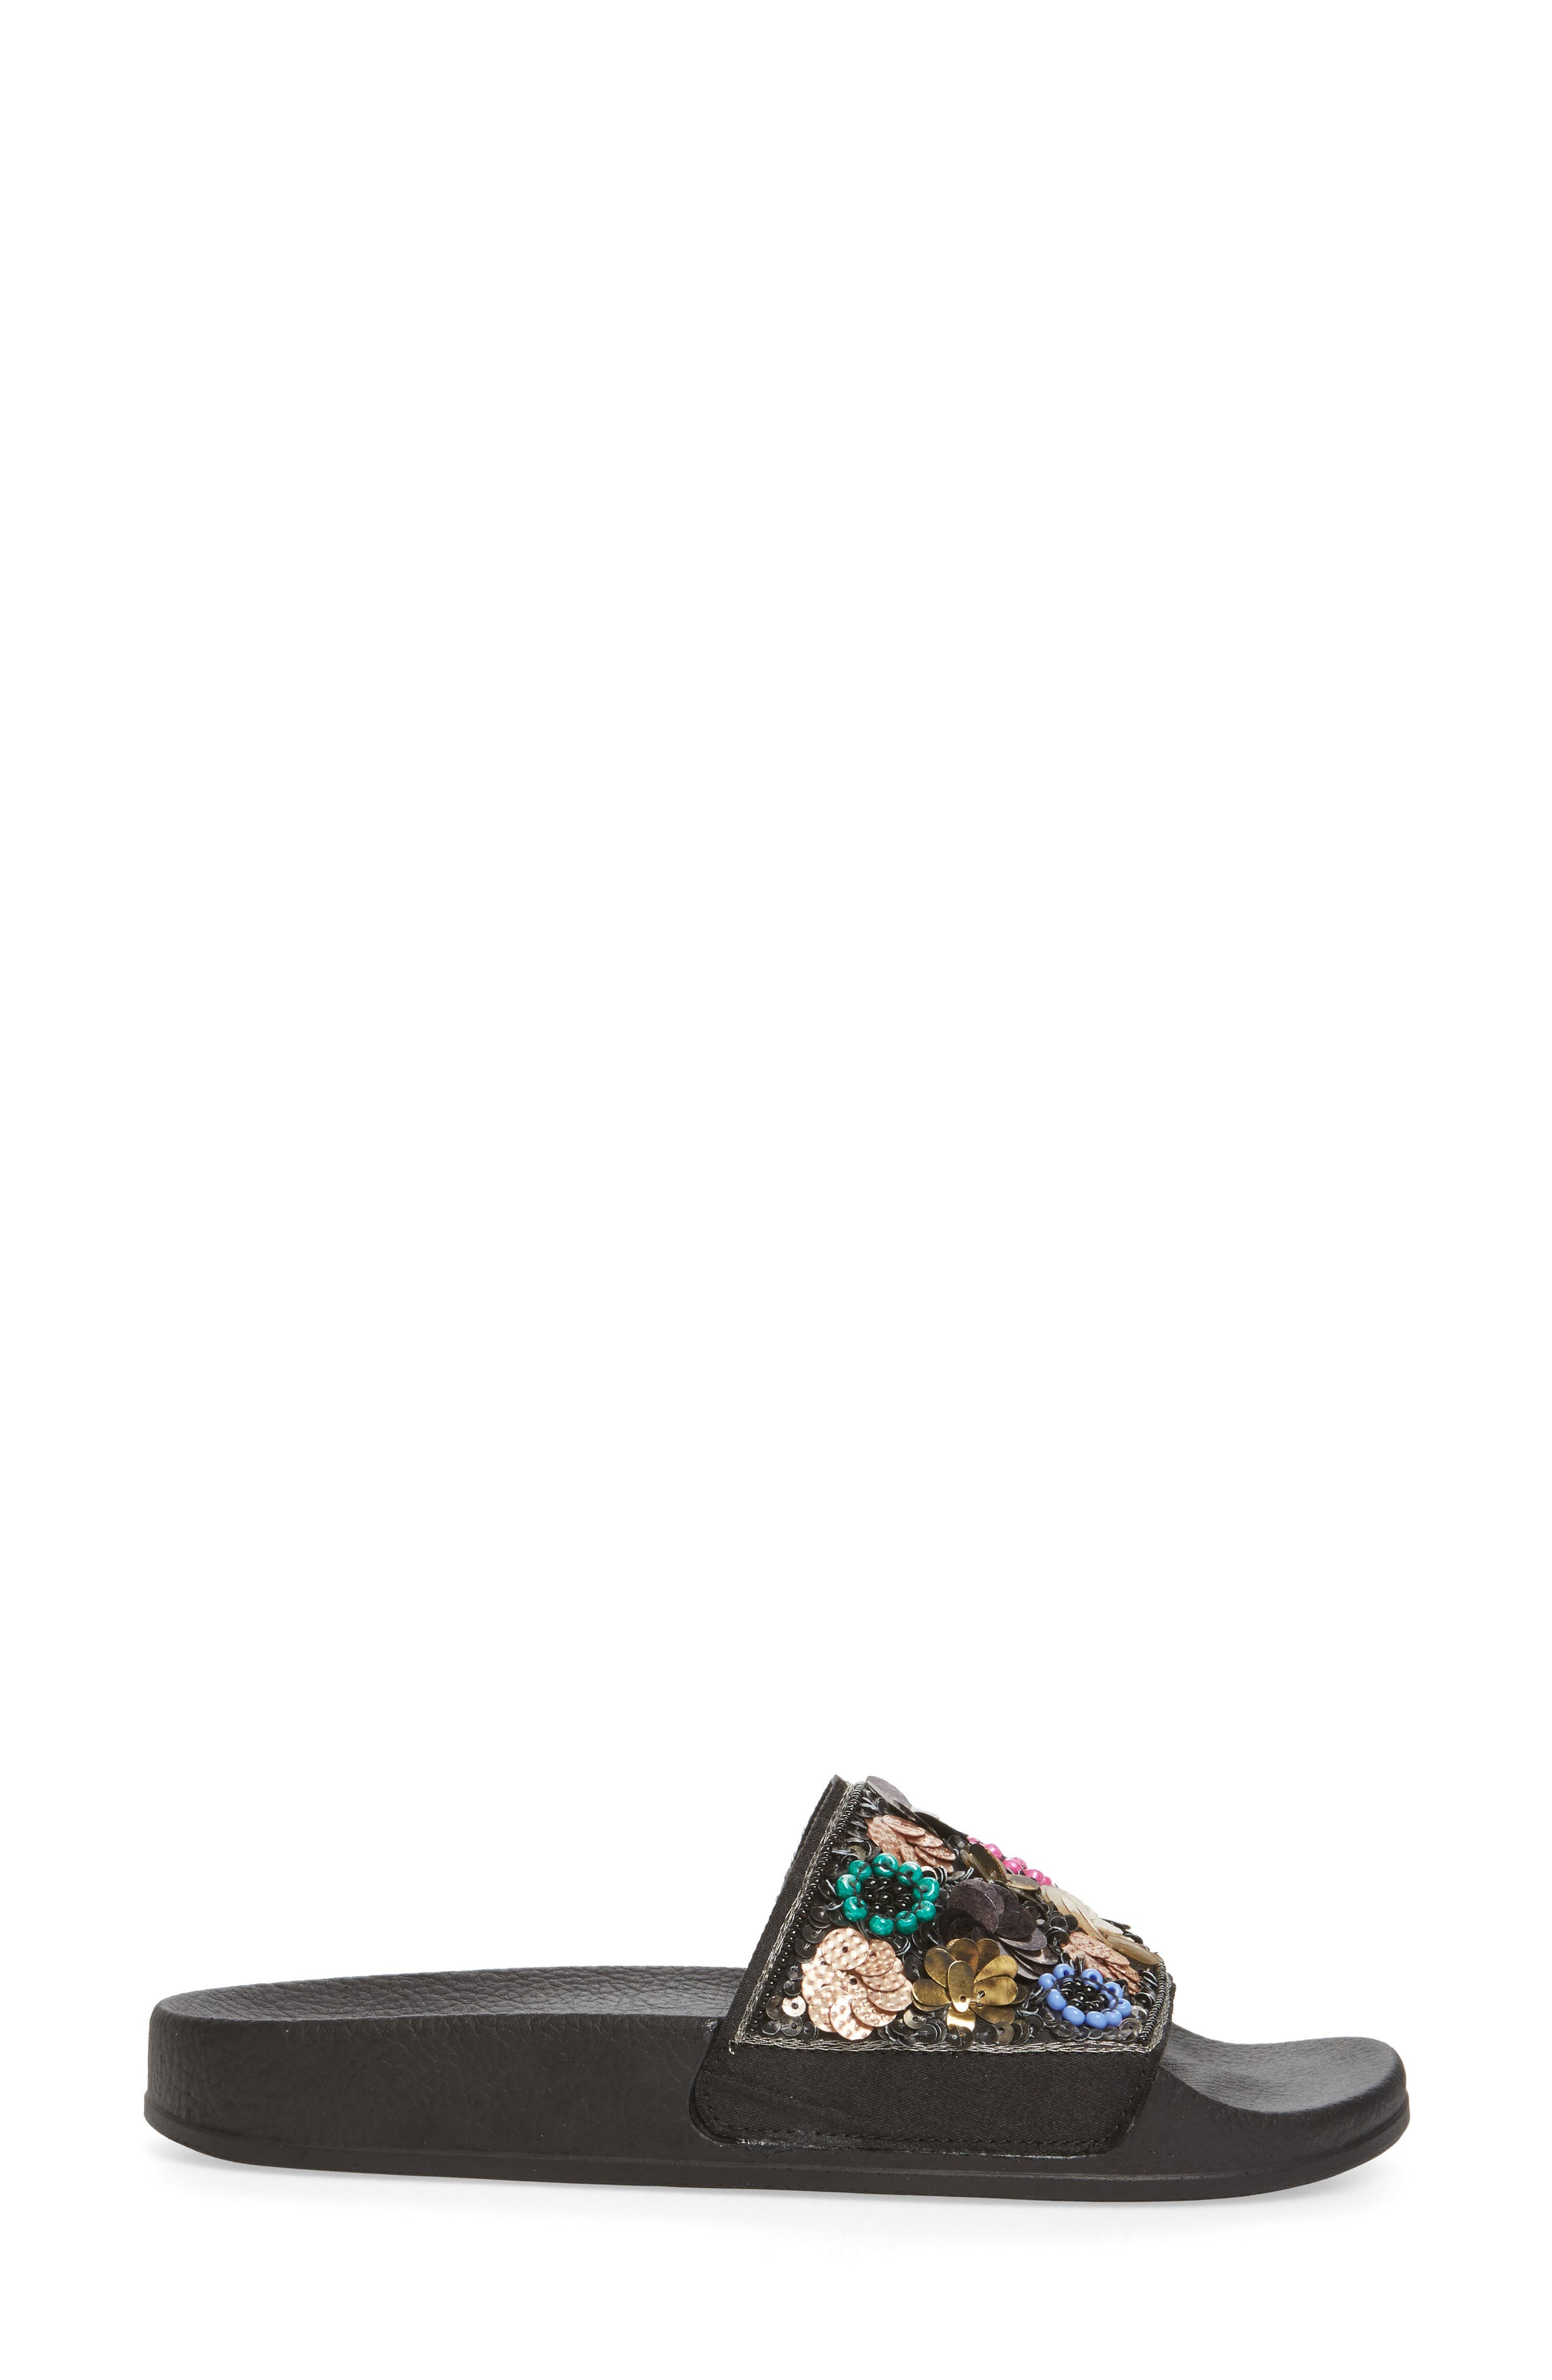 Maddy Embellished Slide Sandal,                             Alternate thumbnail 3, color,                             Flower Multi